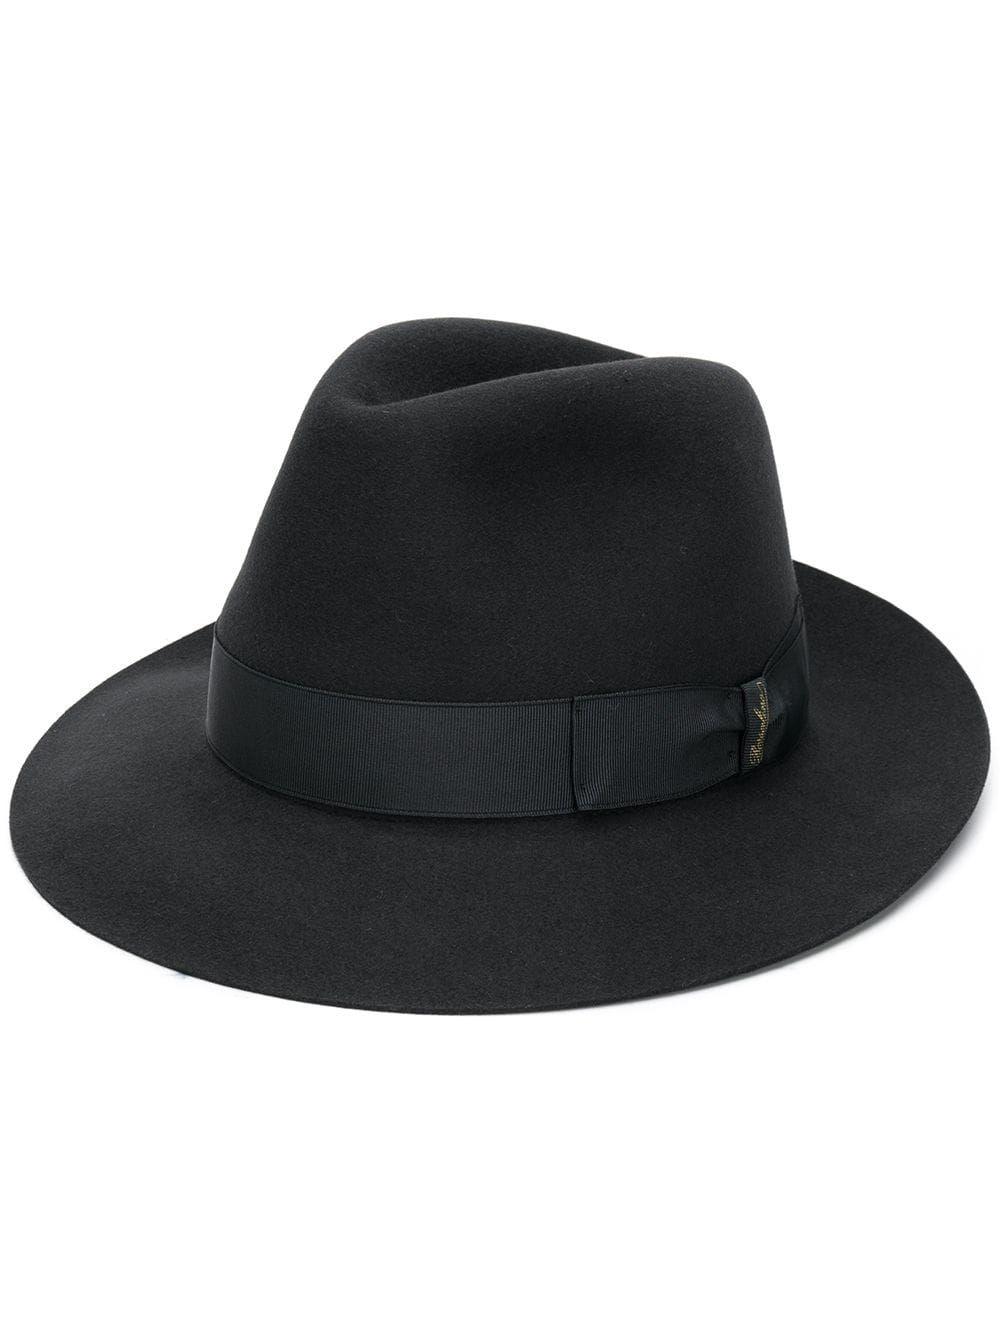 27a108fe8452e4 BORSALINO BORSALINO FEDORA HAT - BLACK. #borsalino | Borsalino ...